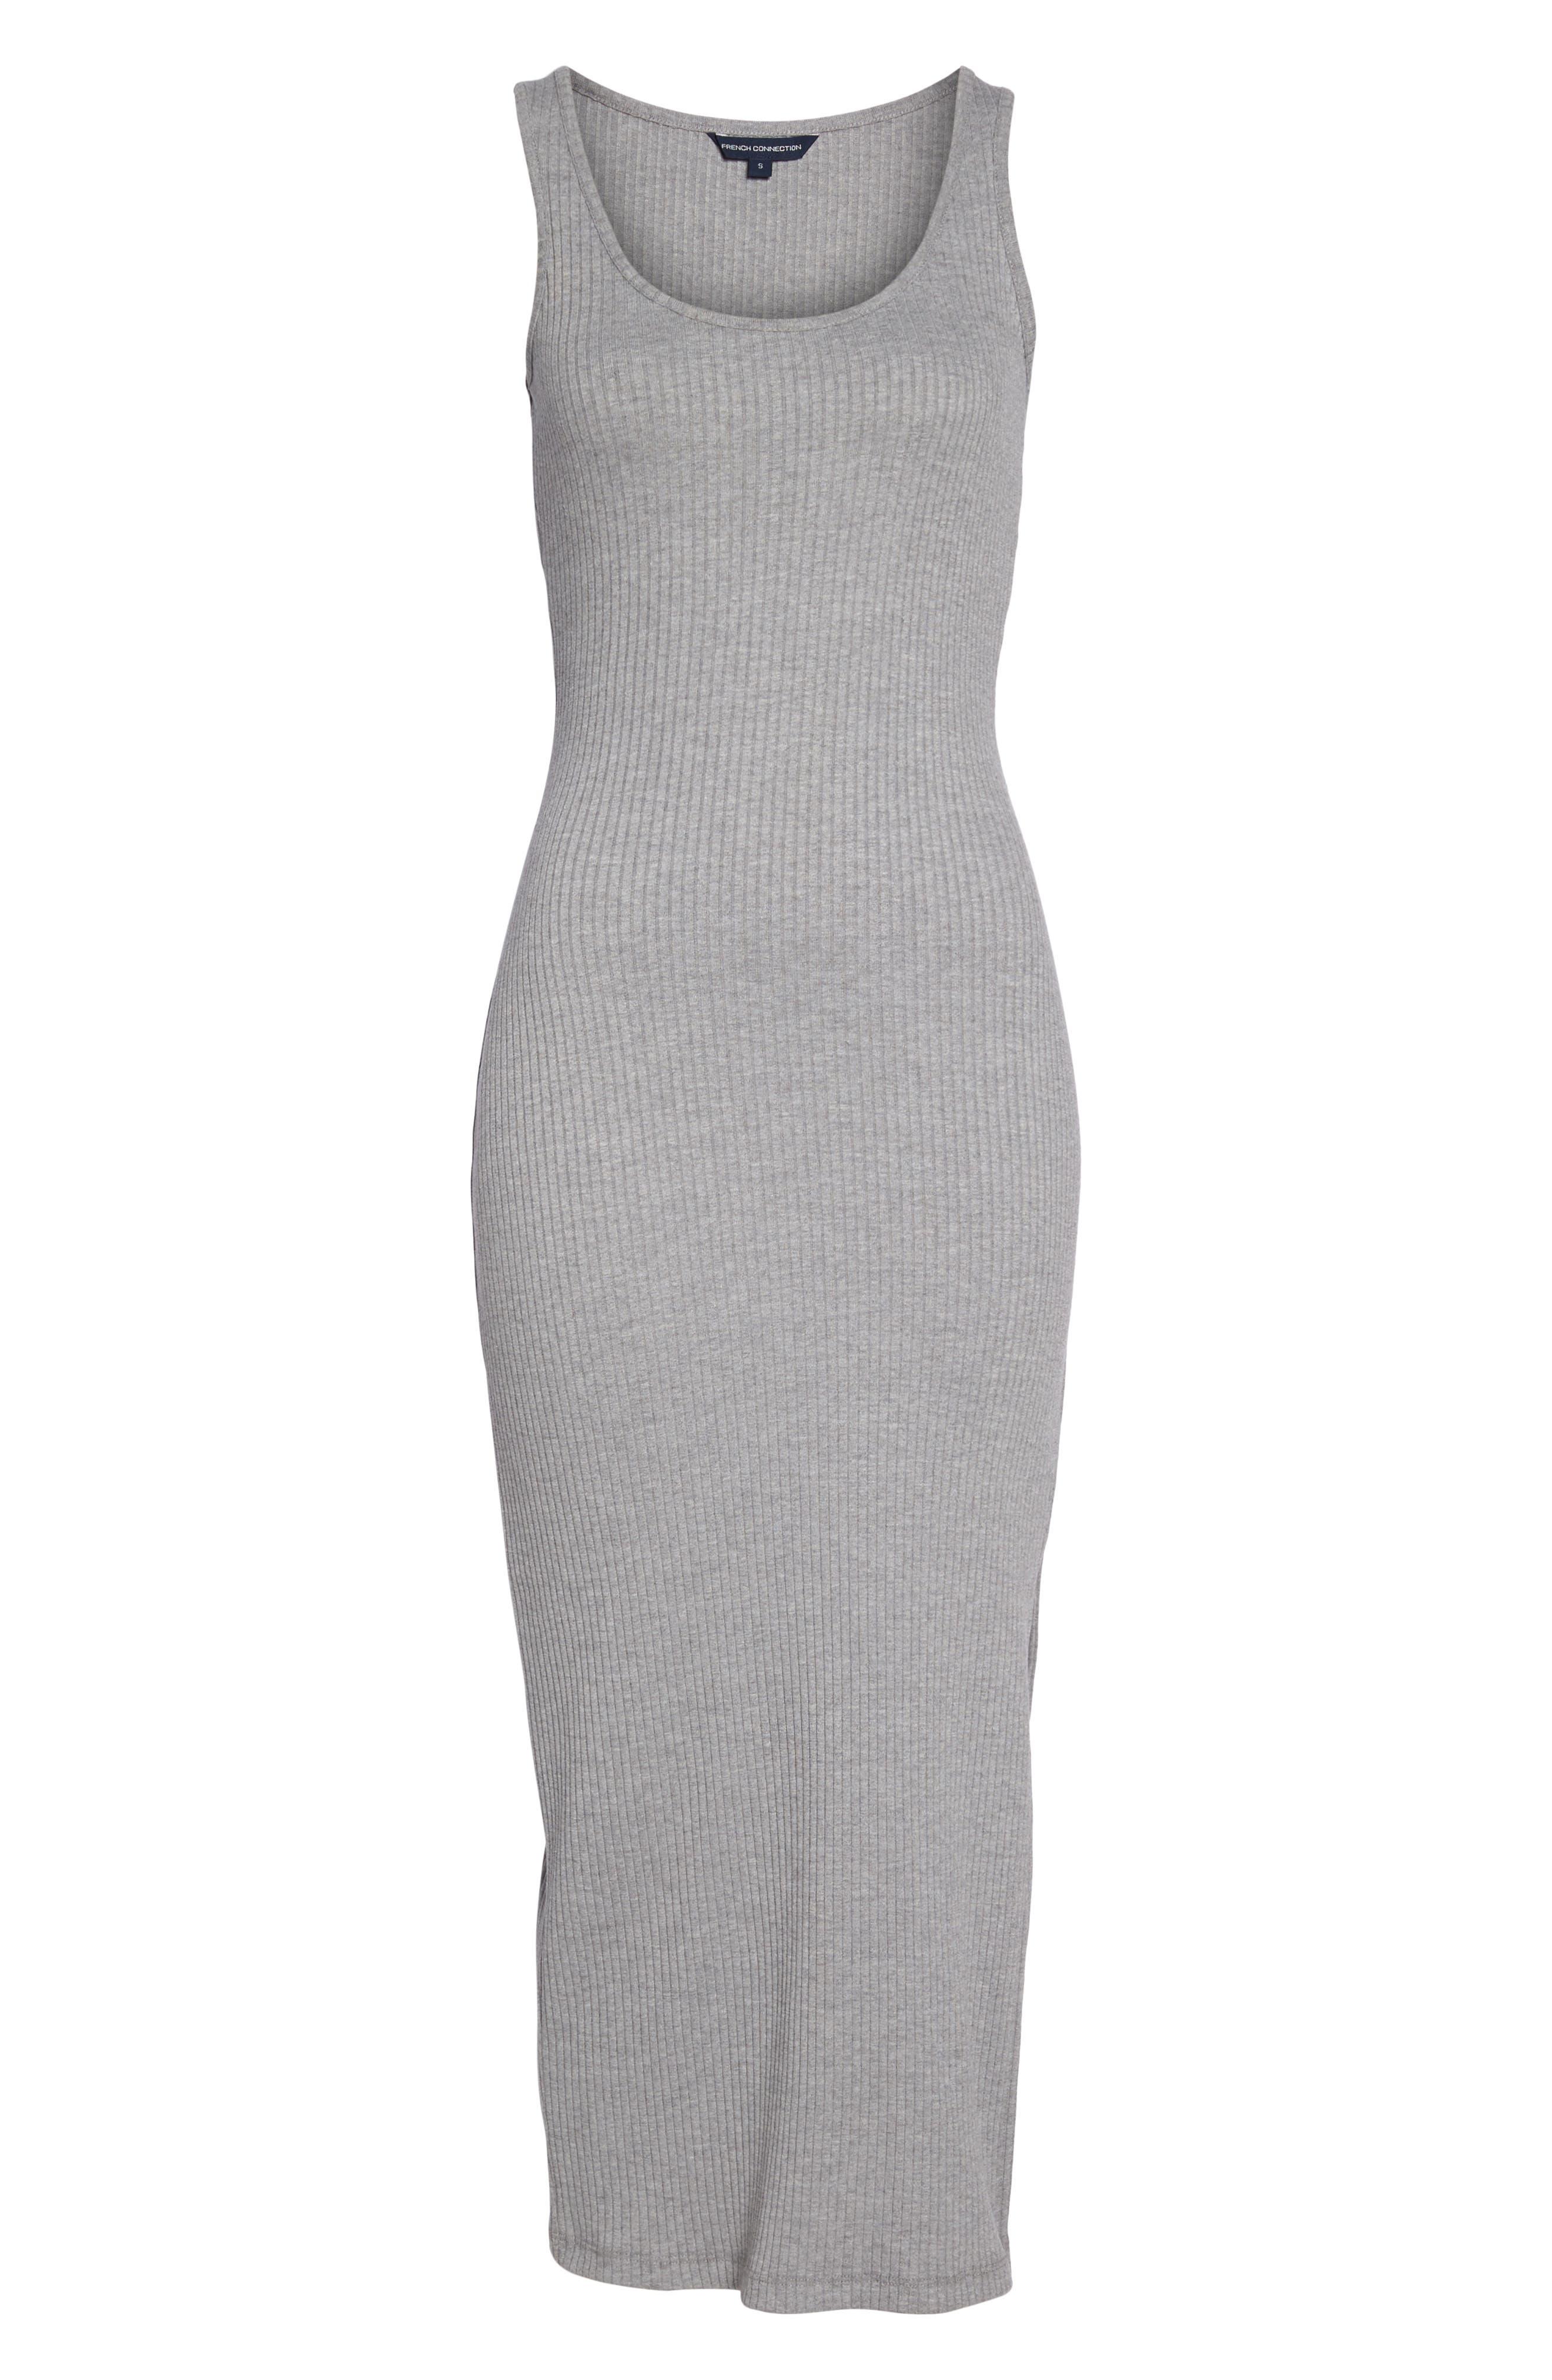 Tommy Rib Knit Tank Dress,                             Alternate thumbnail 7, color,                             Mid Grey Mel